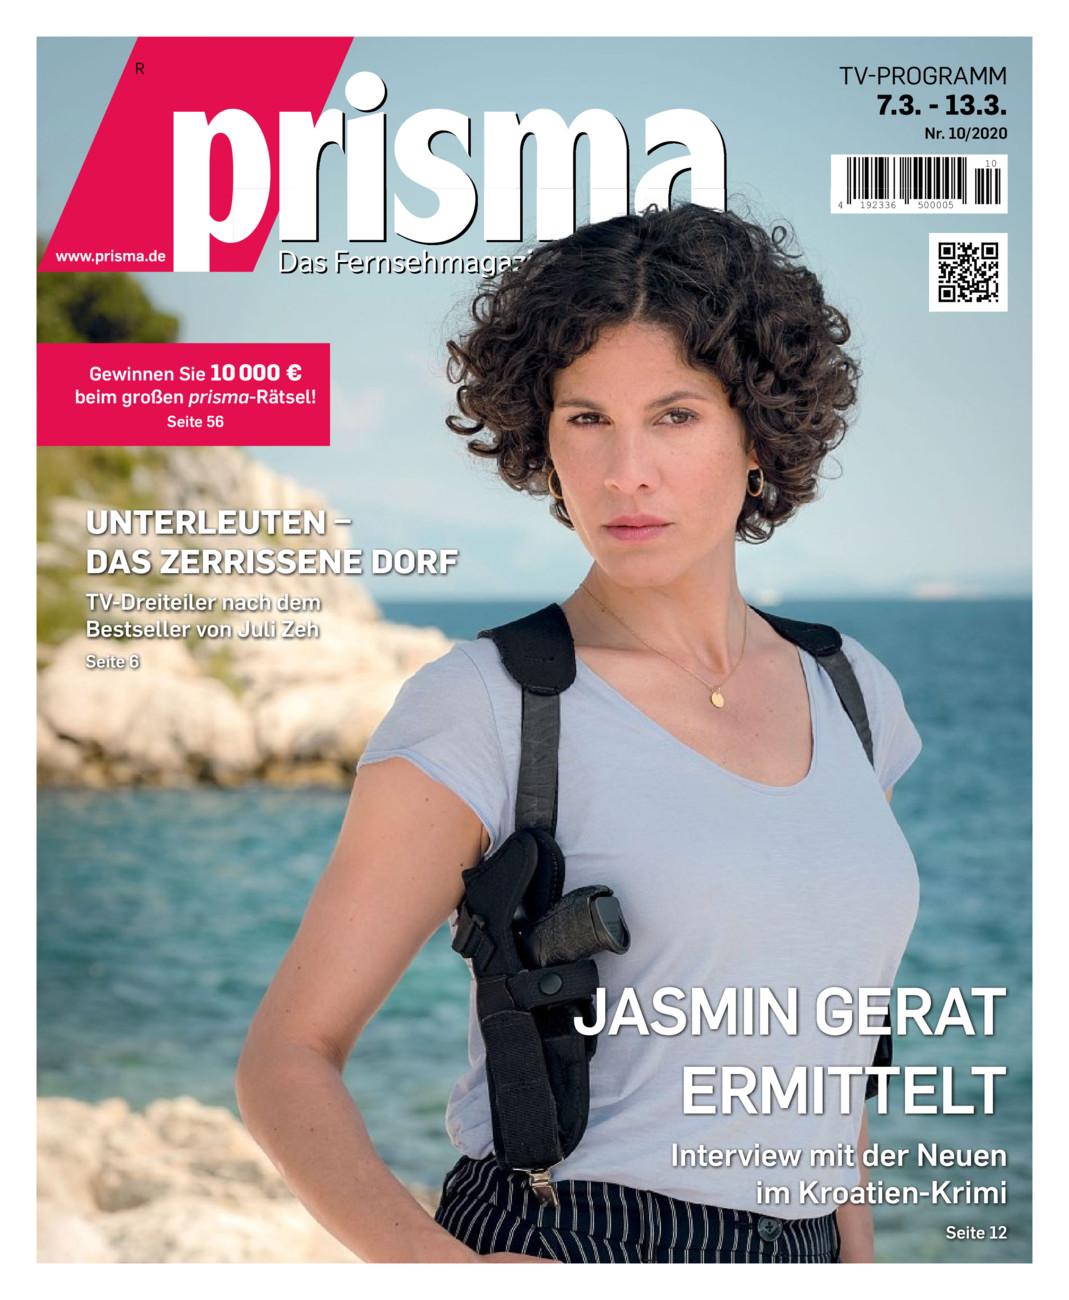 Prisma 7. - 13.3